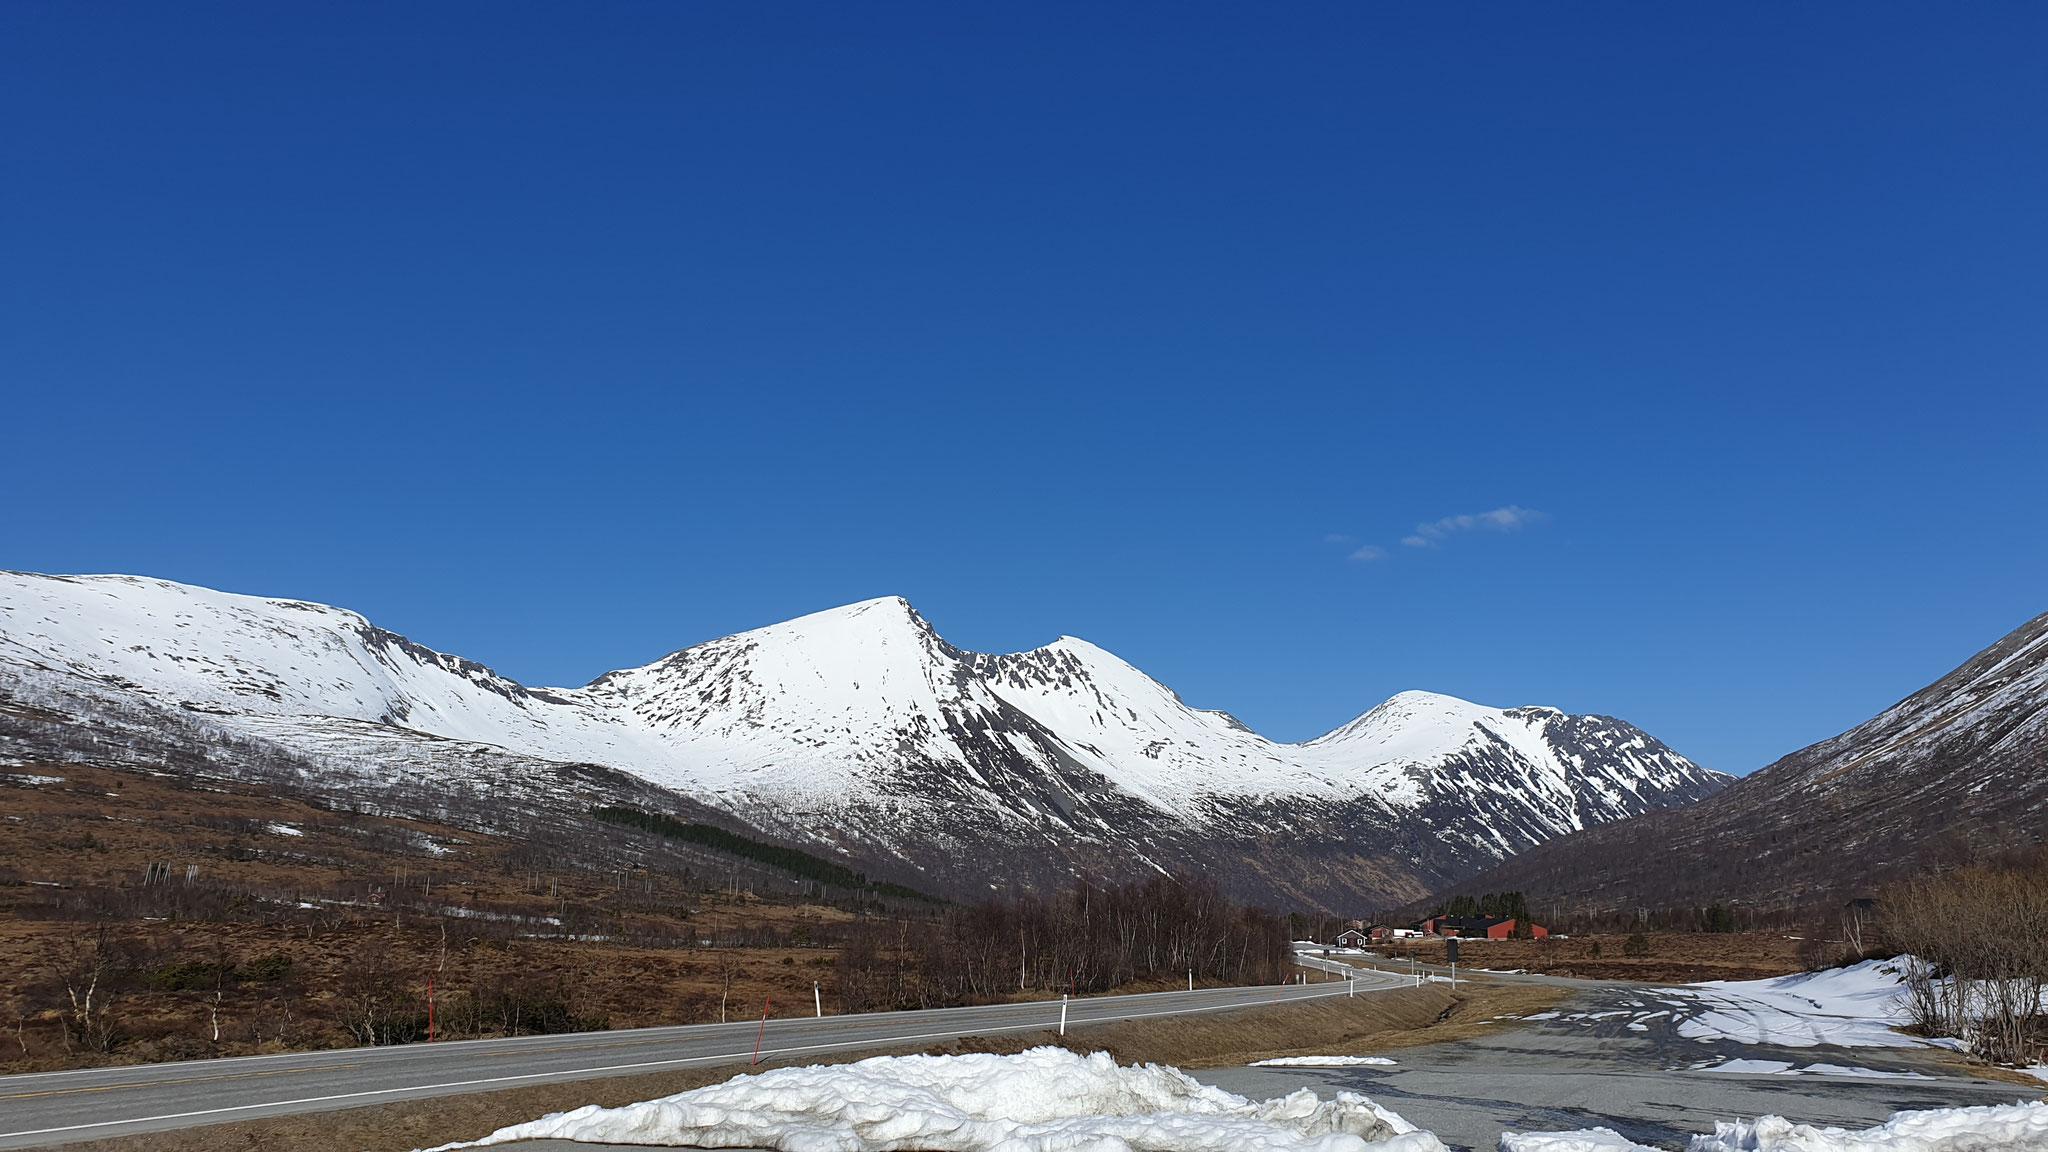 Der angebissene Berg